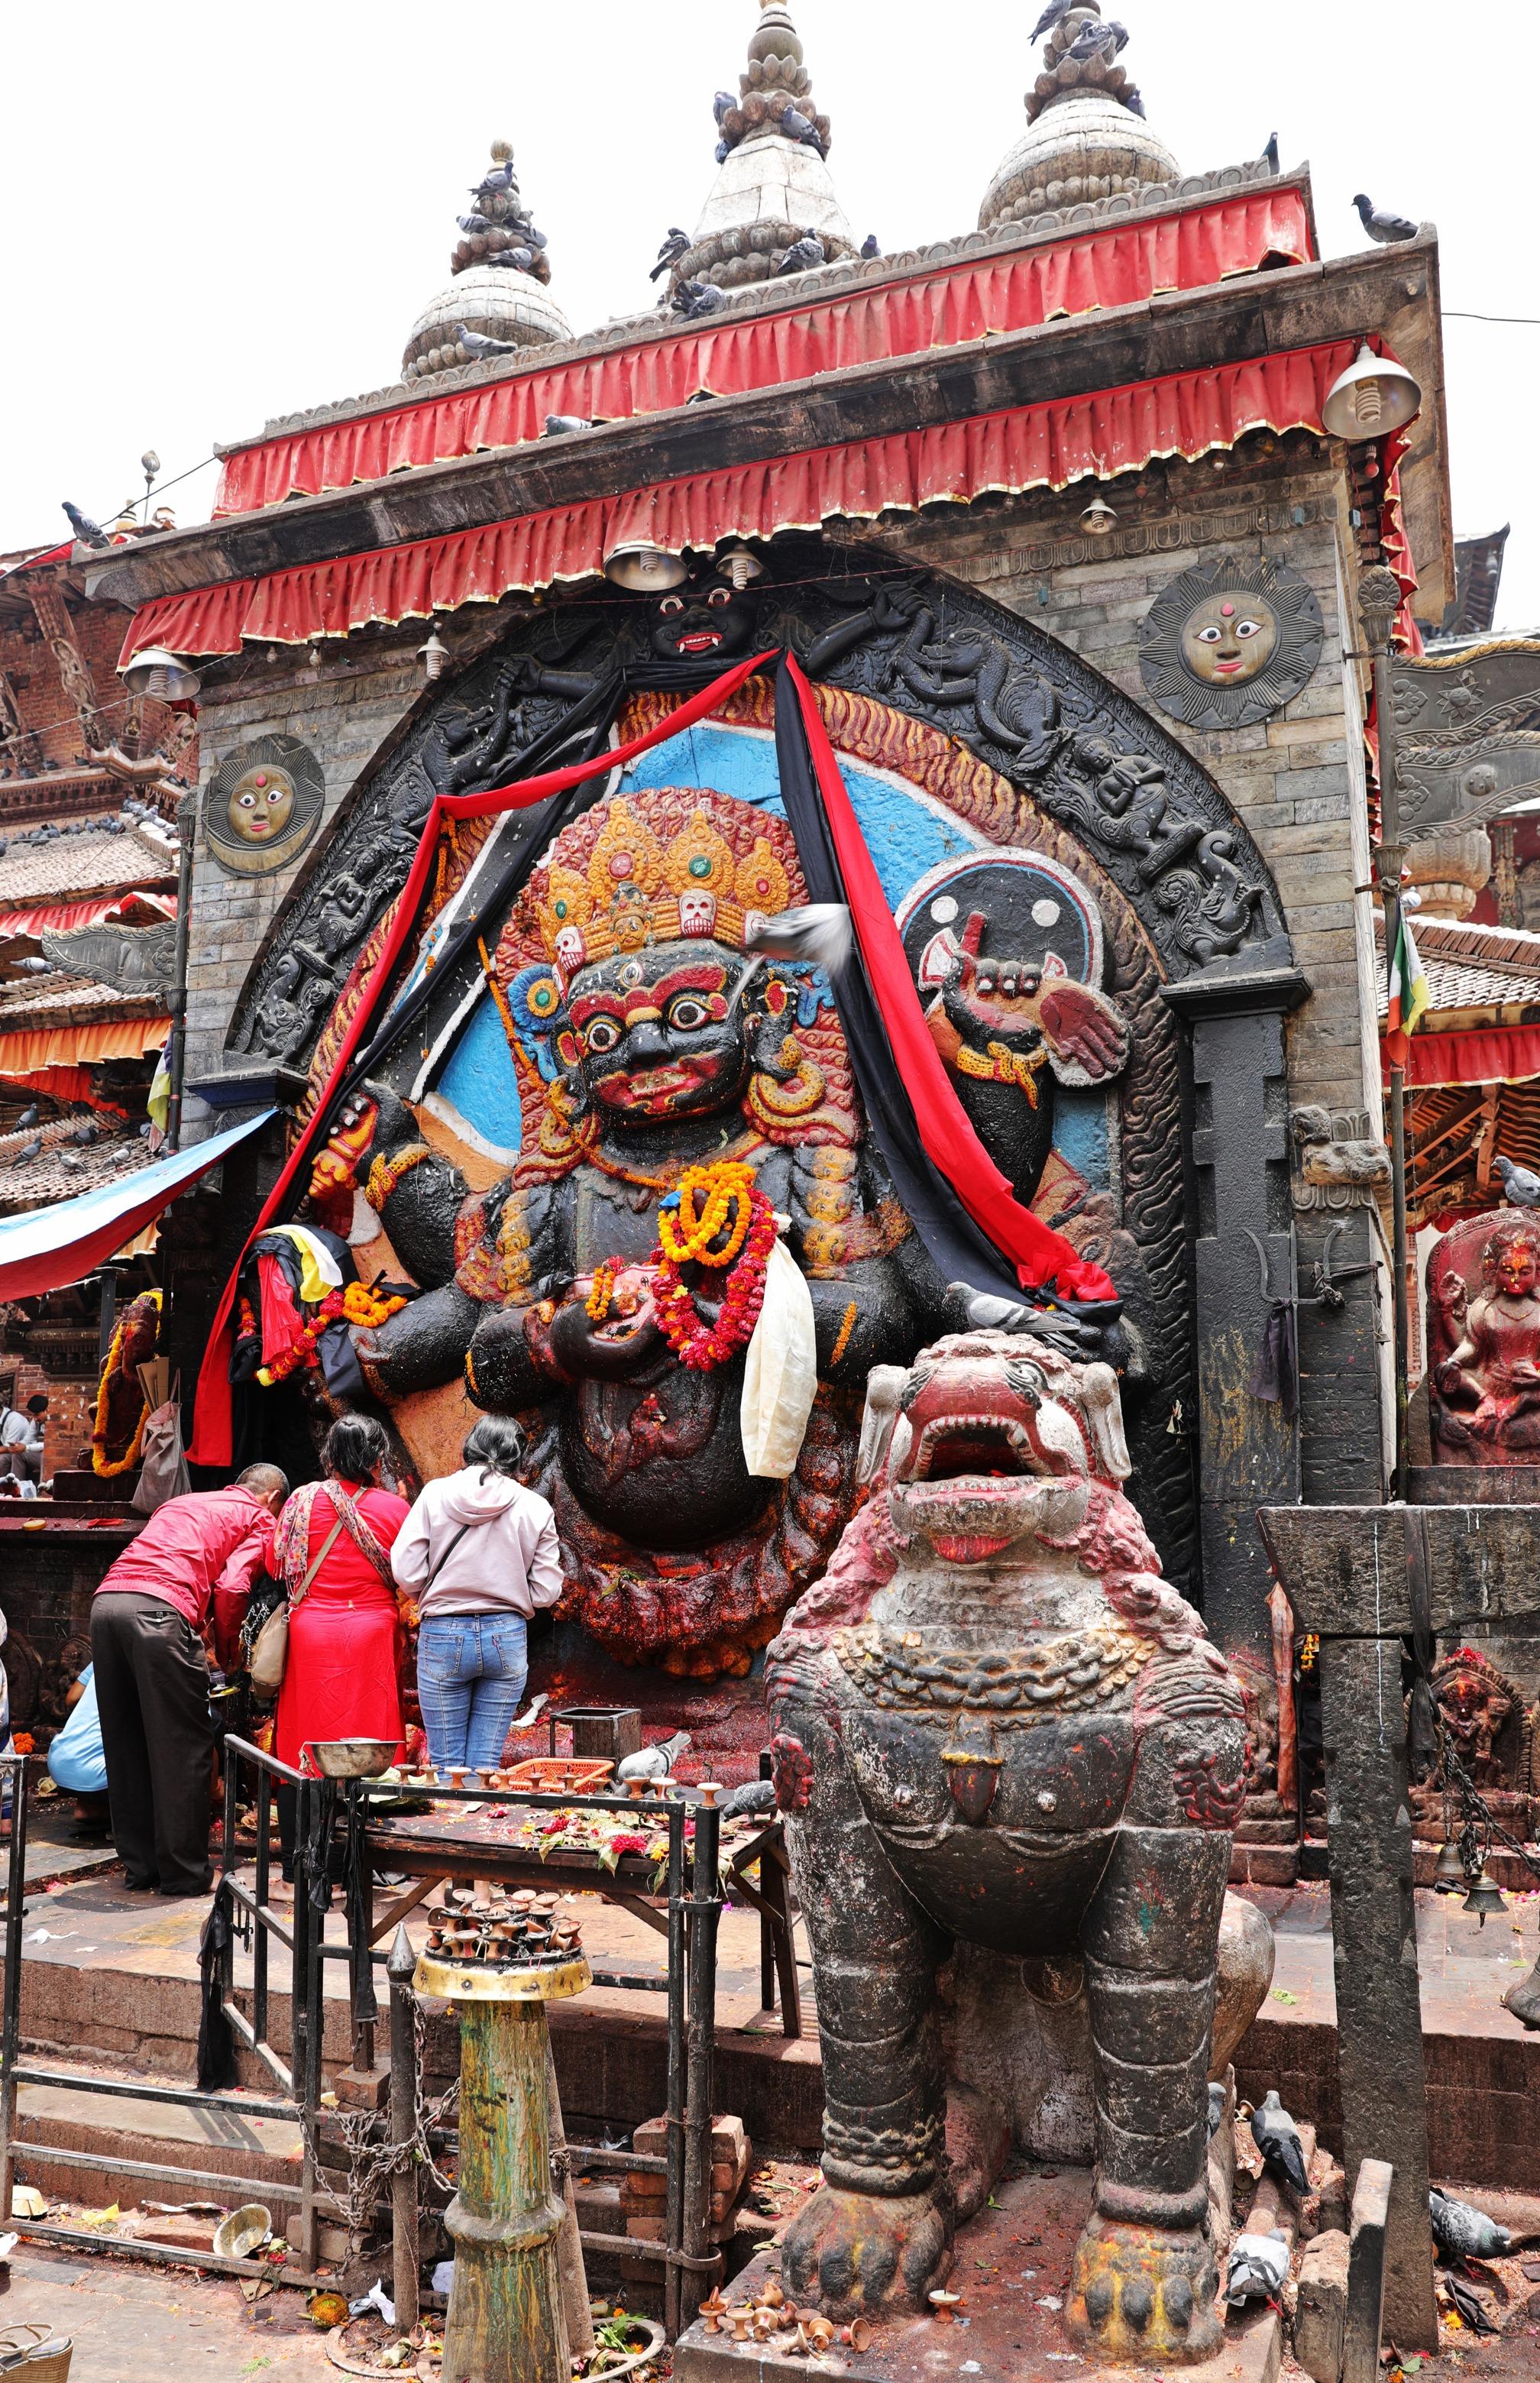 Kali Statue, Durbar Square, Kathmandu